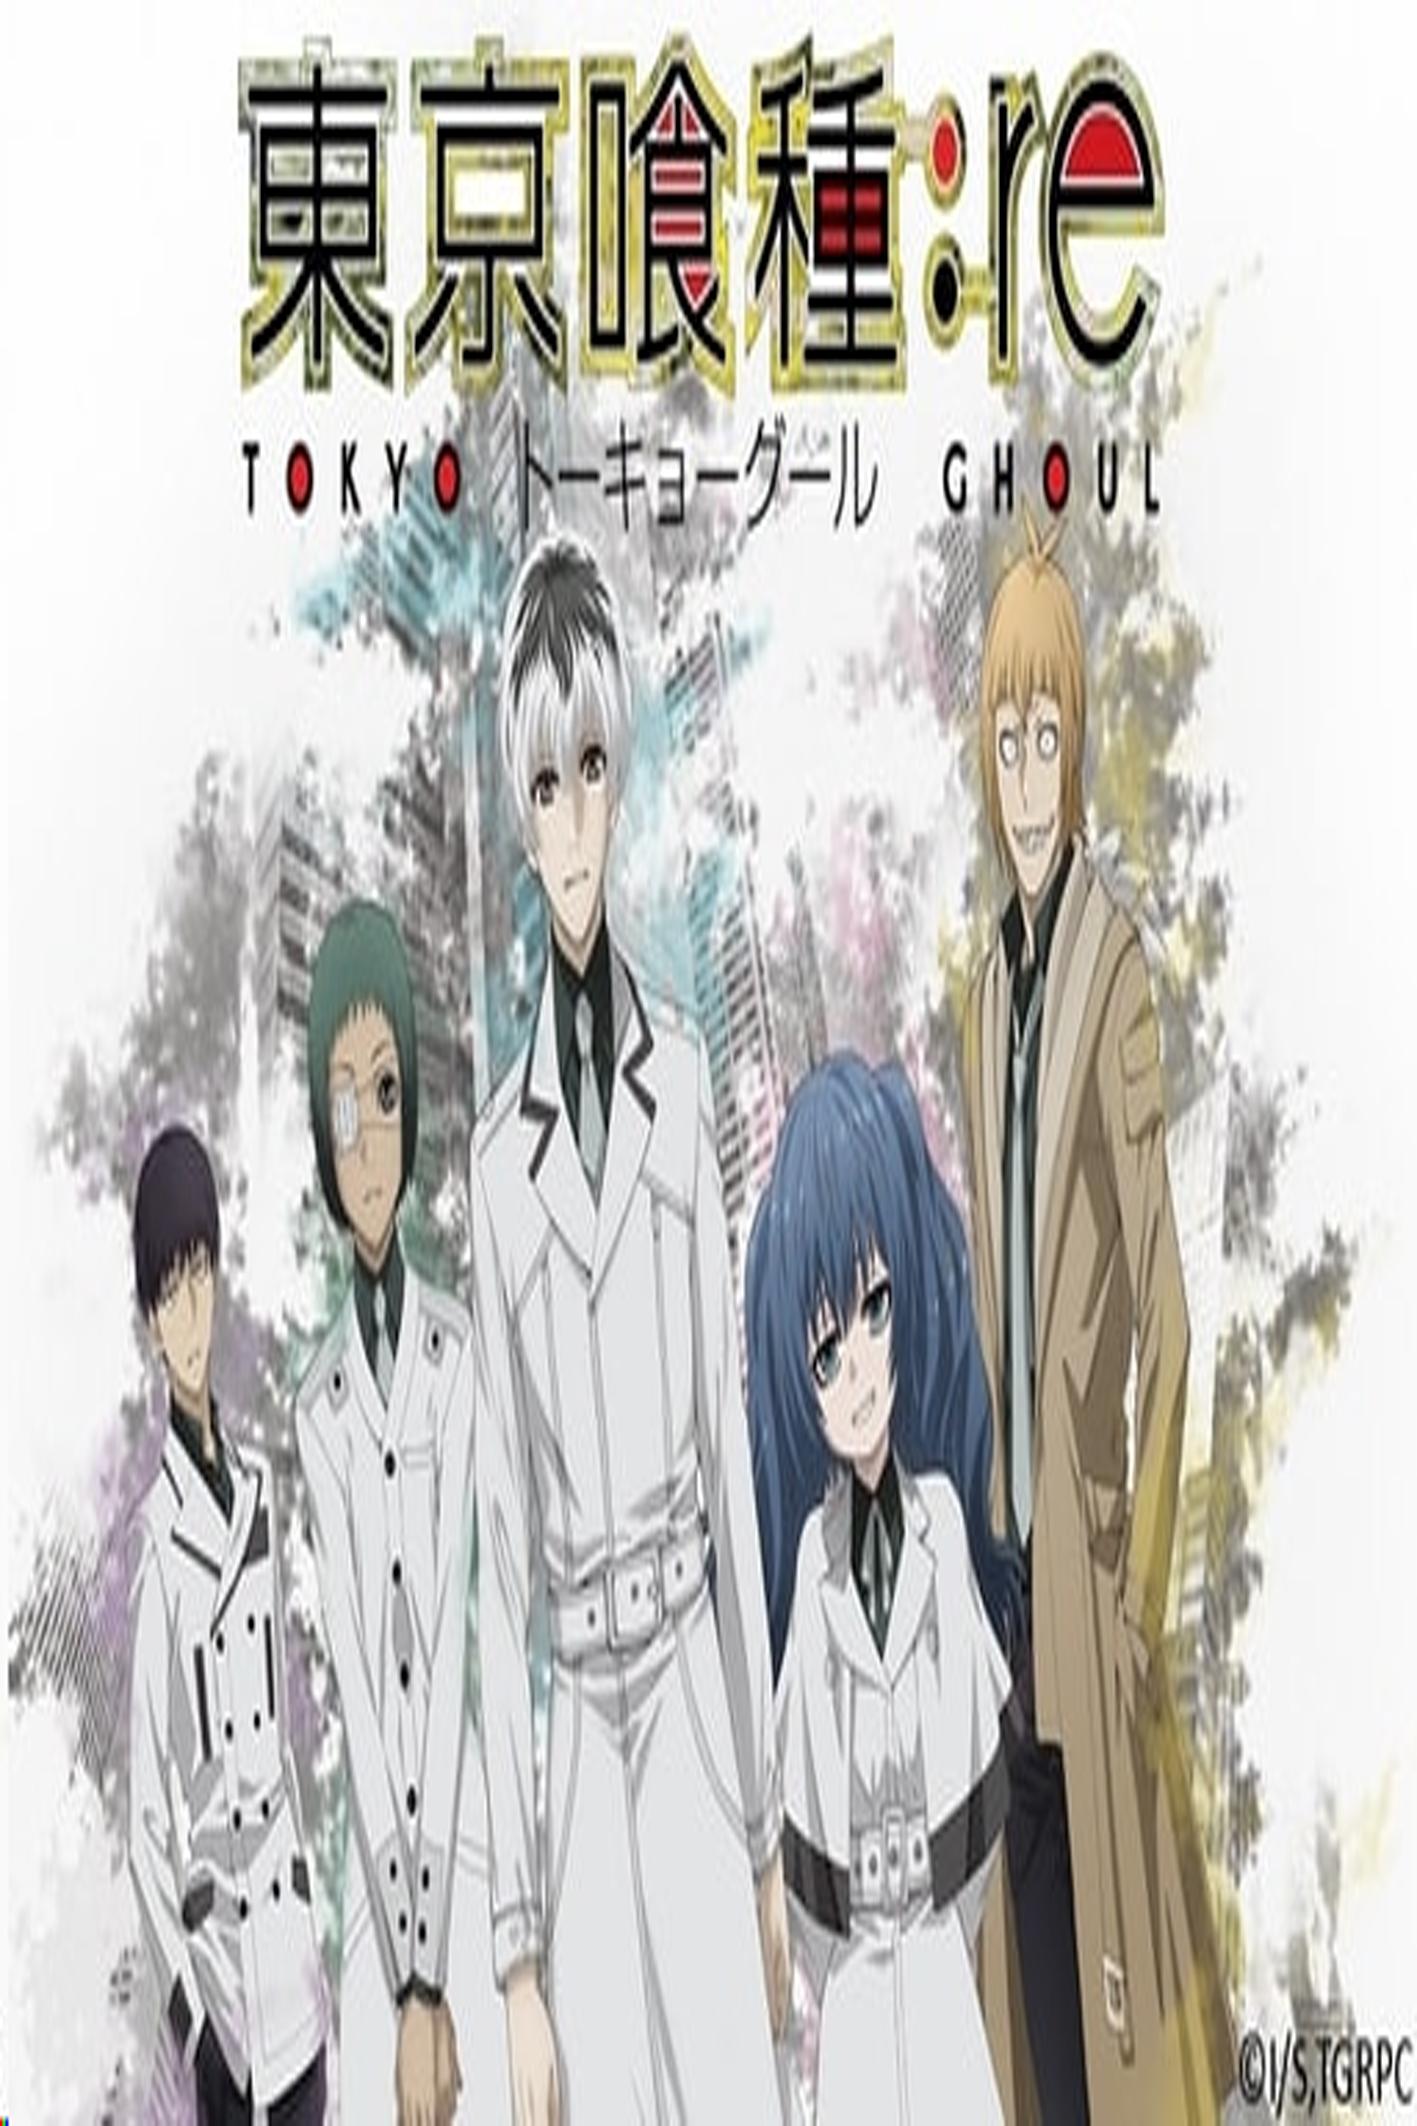 Tokyo Ghoul : re - 東京喰種 : re